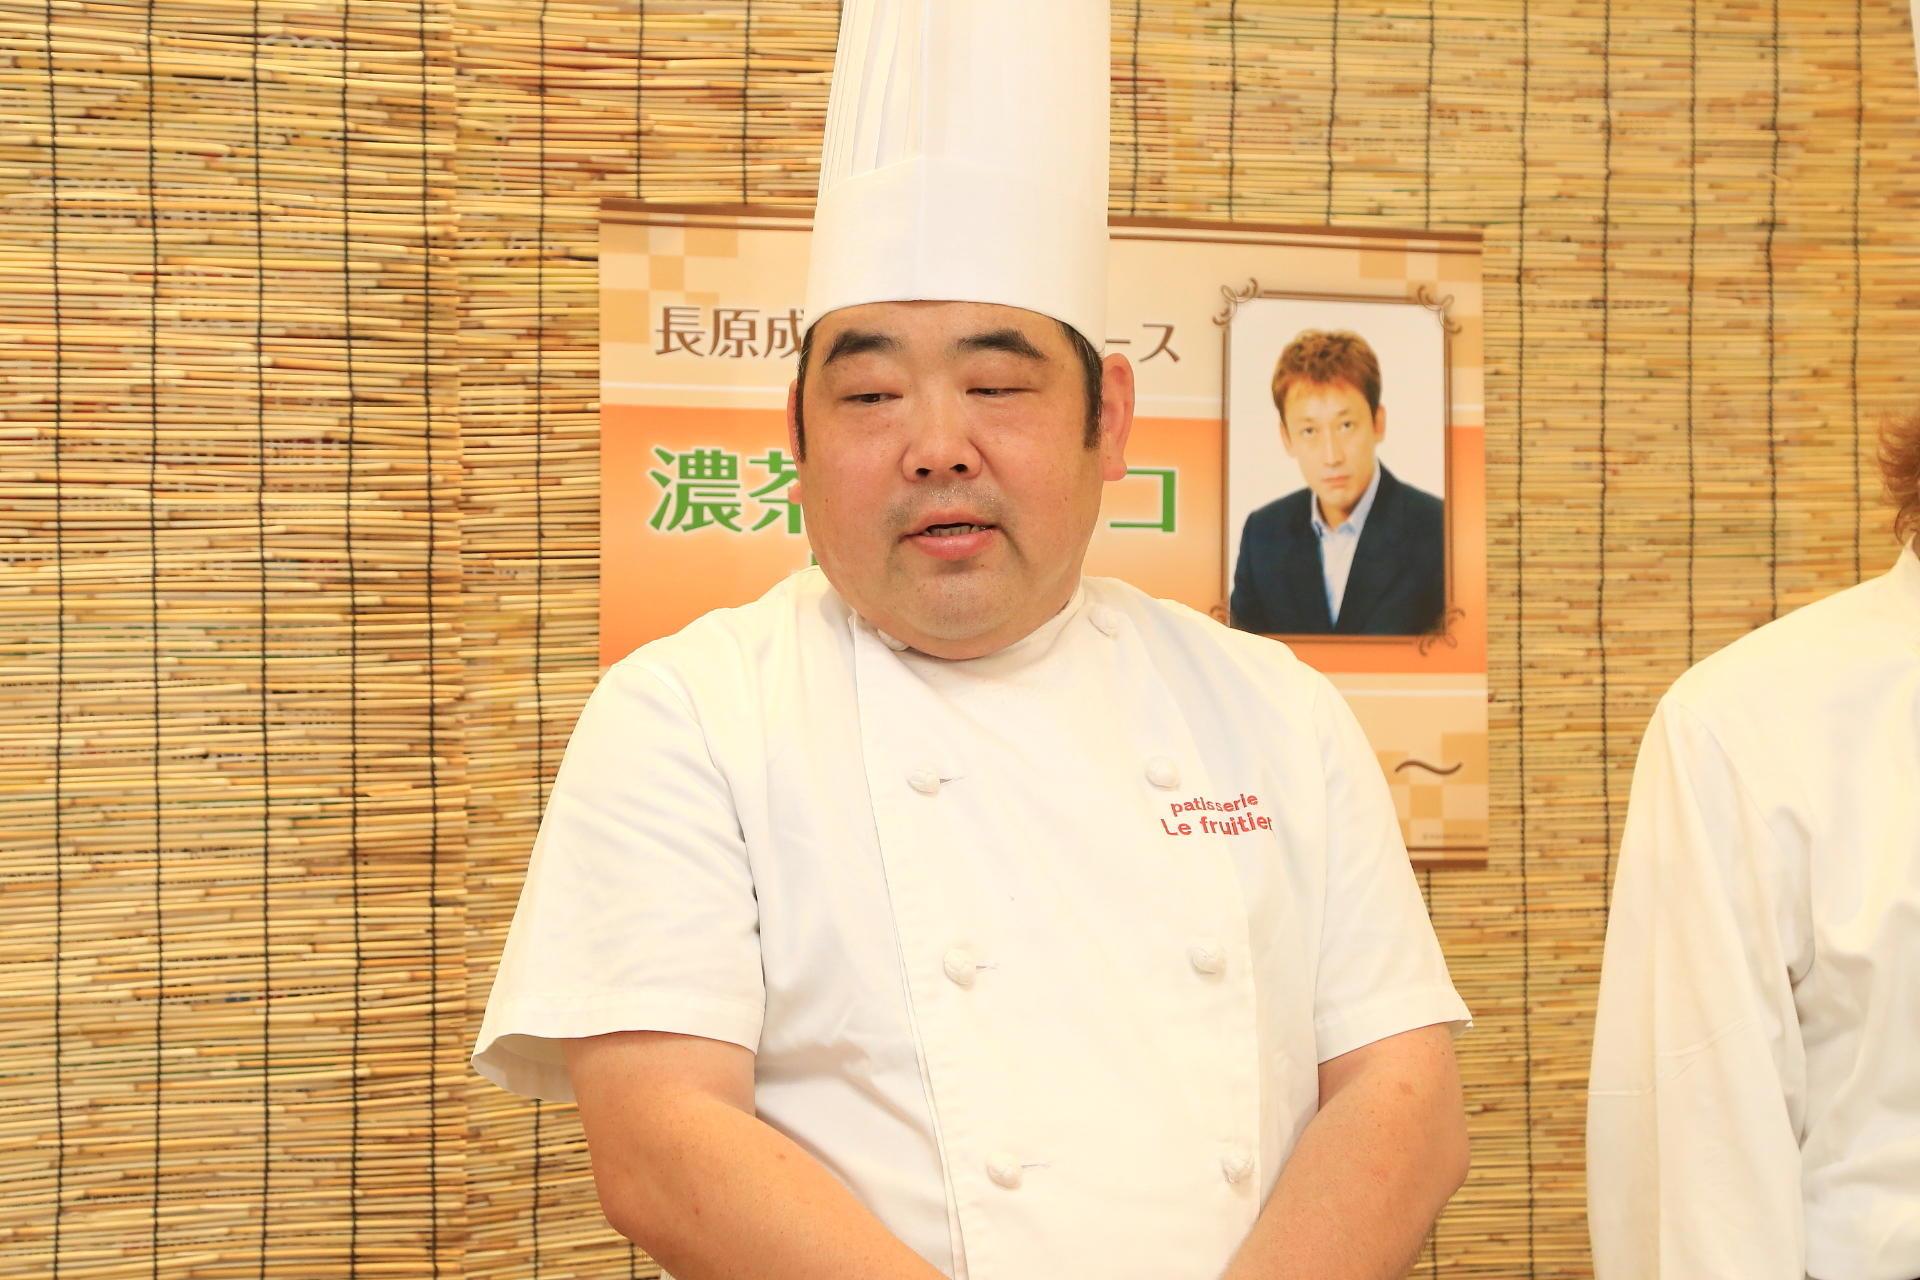 http://news.yoshimoto.co.jp/20170815163242-a9568832a5dac949bcb03de65d207d7ab95fe185.jpg